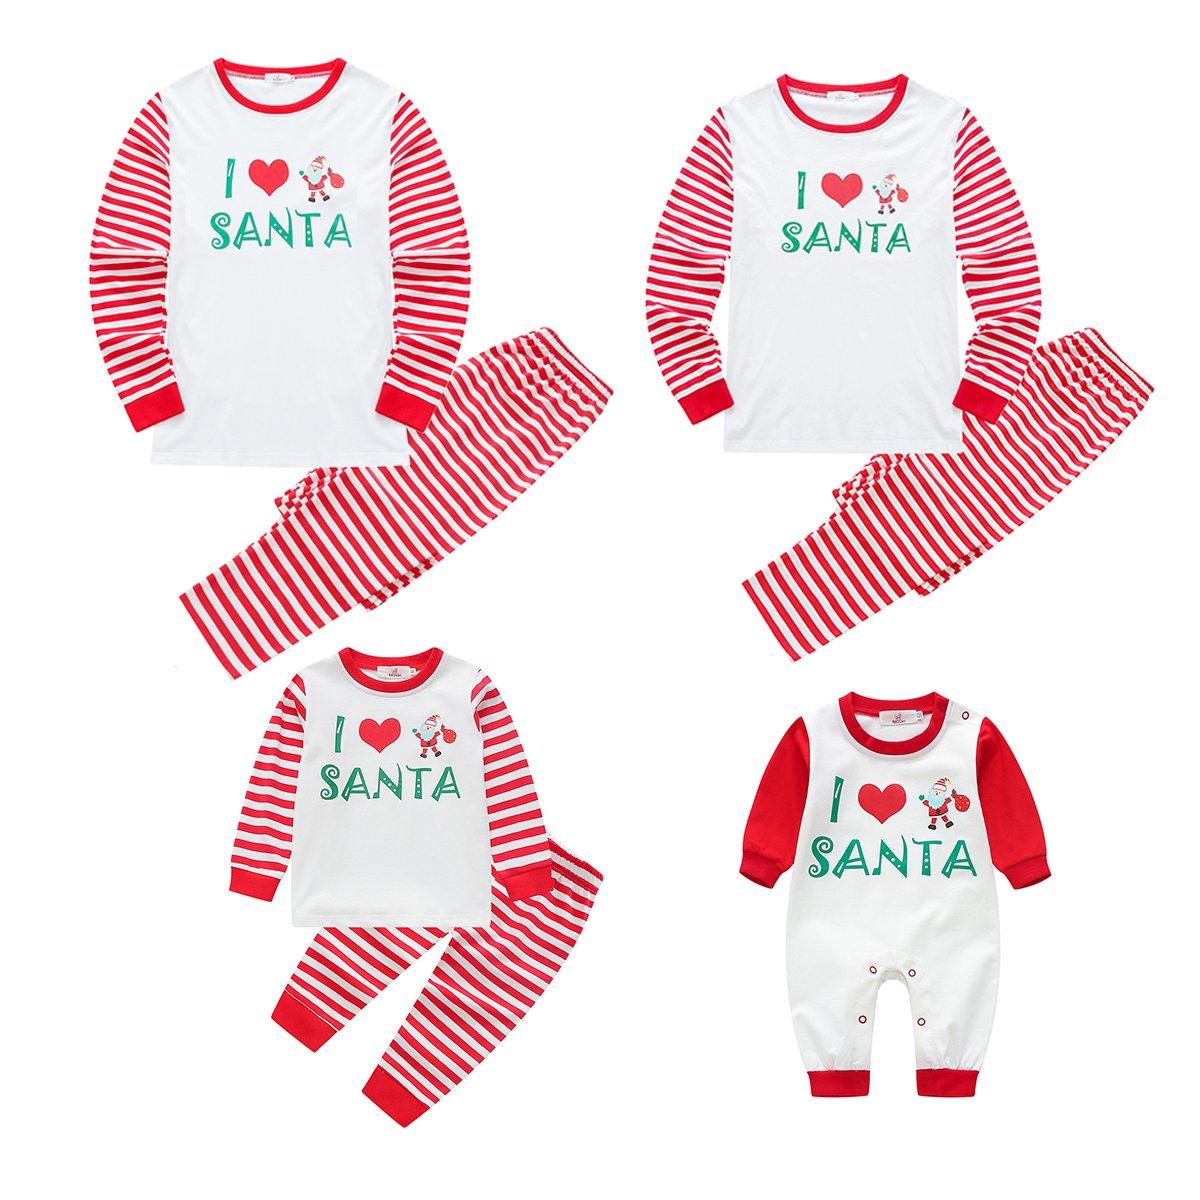 Amazon.com: Baywell I Love Santa, Christmas Family Matching Pajamas ...